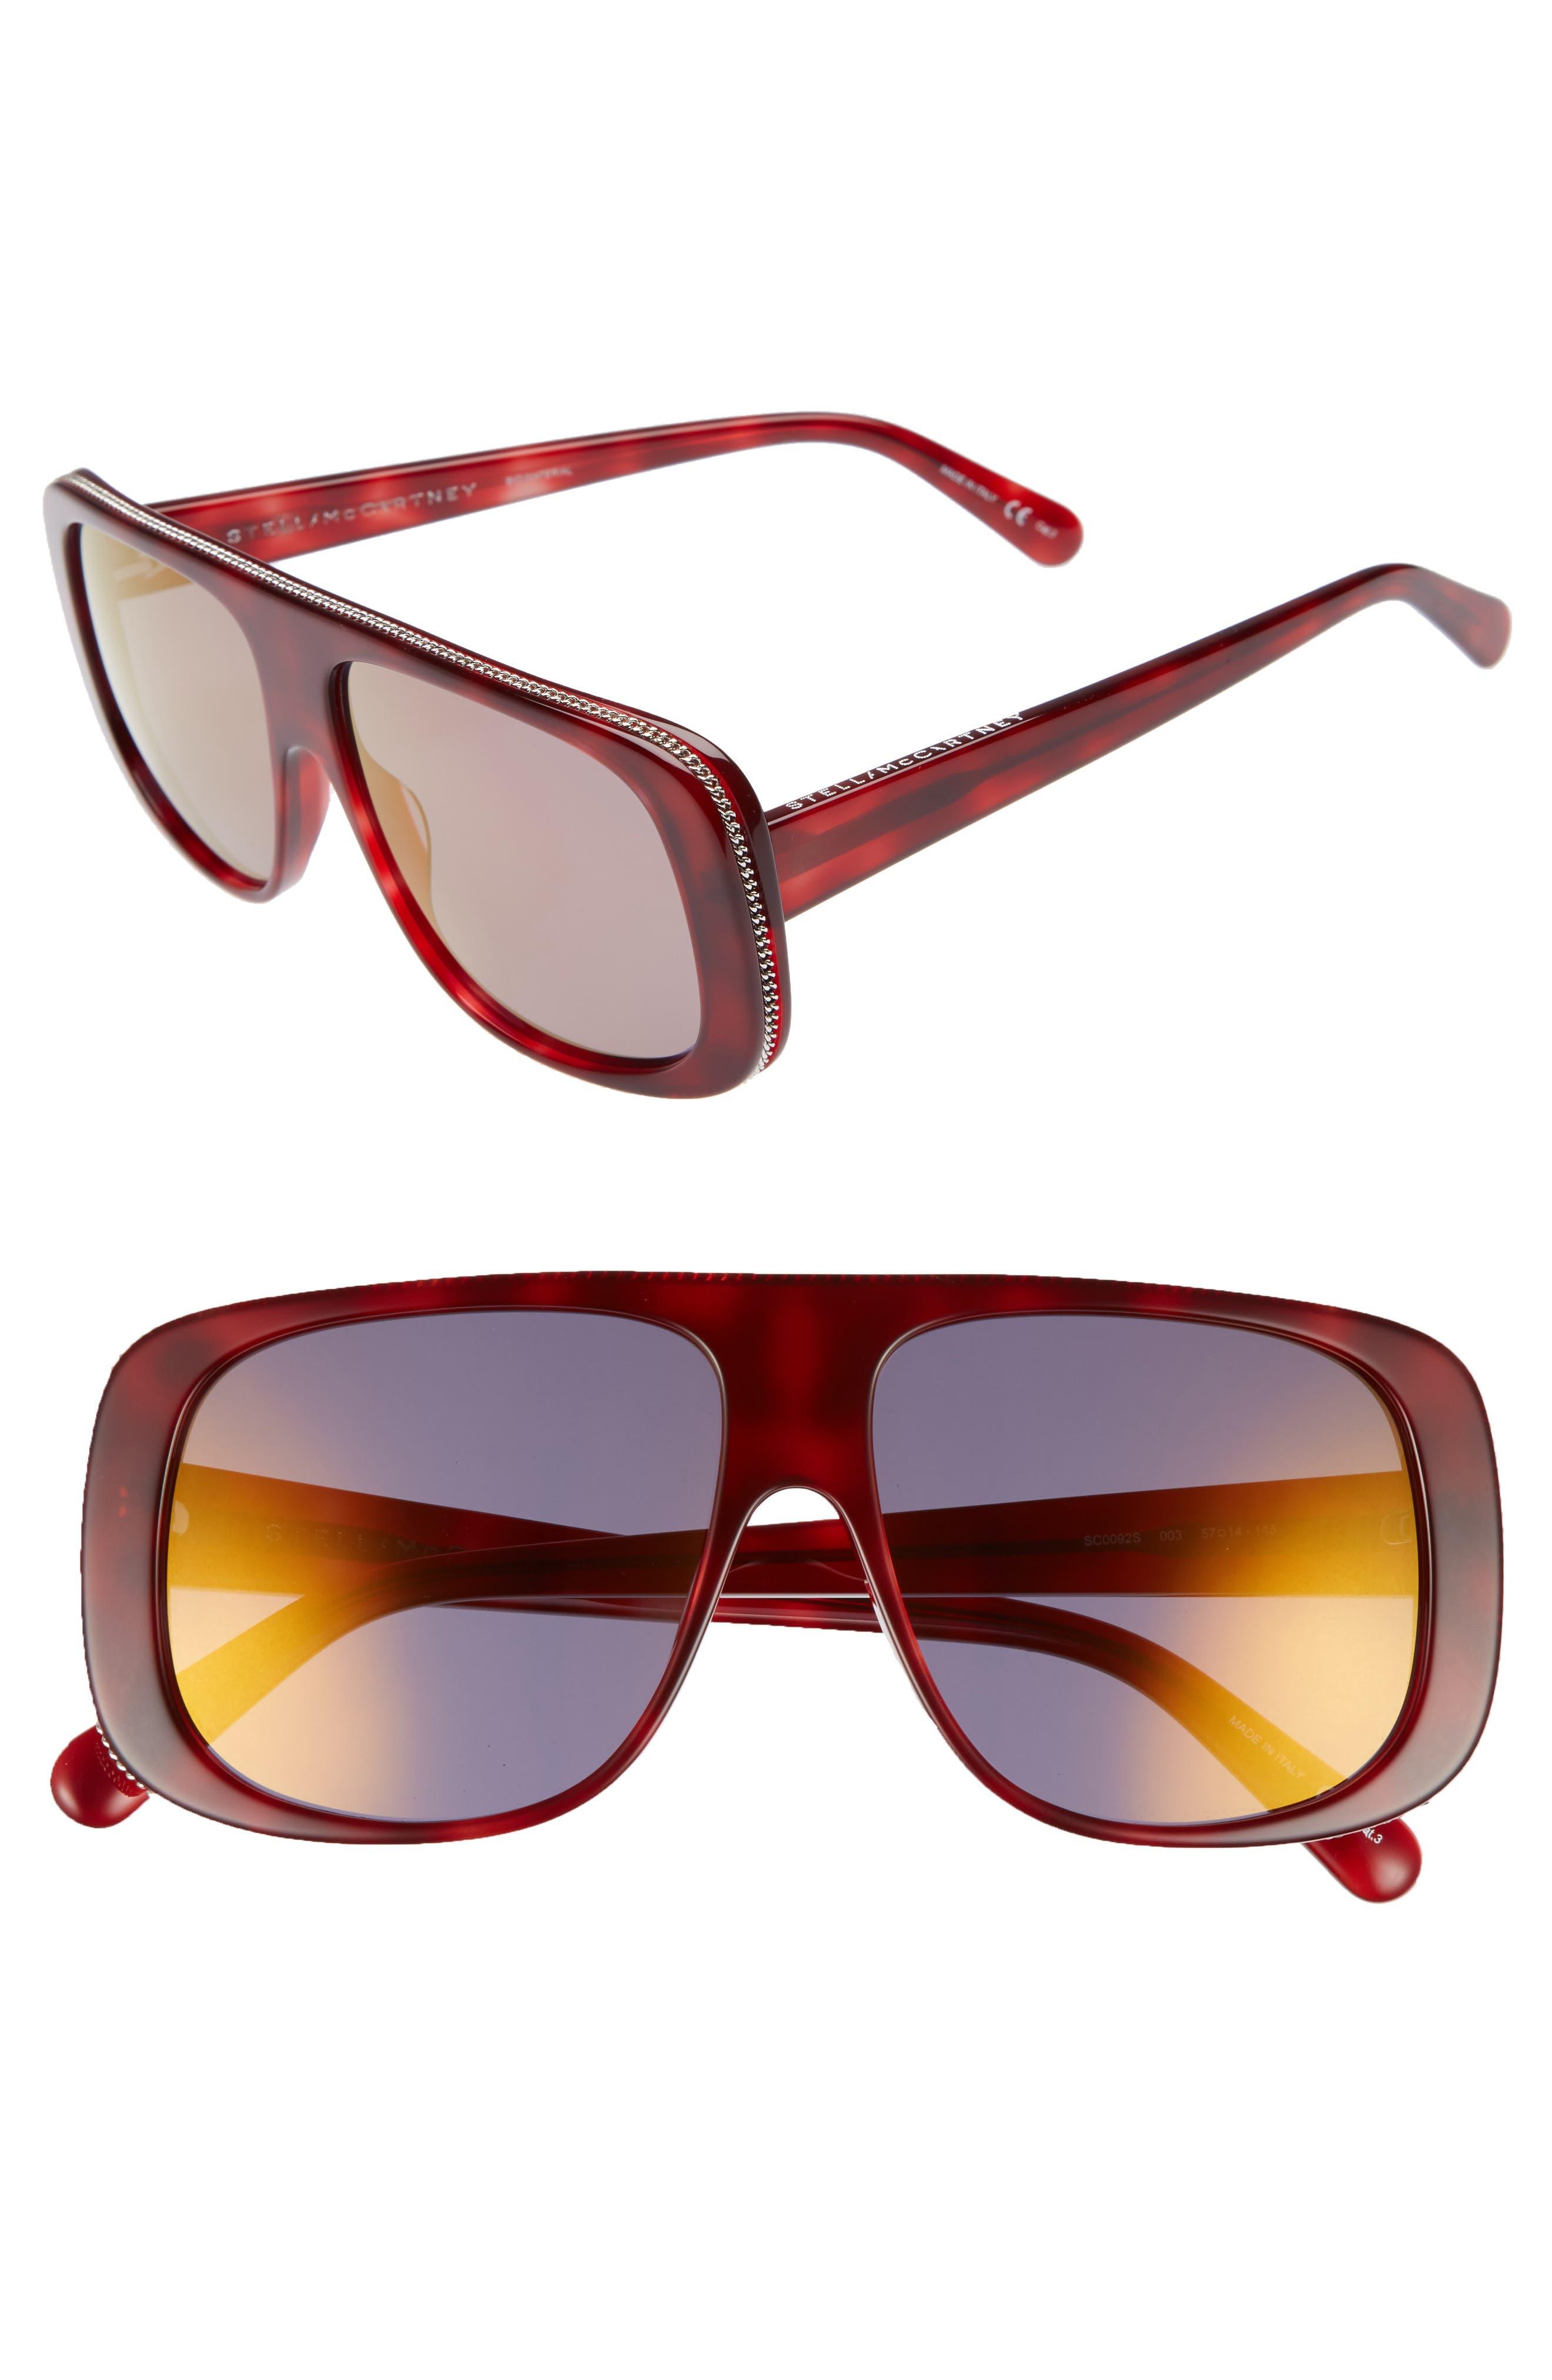 Stella McCartney 57mm Flat Top Sunglasses